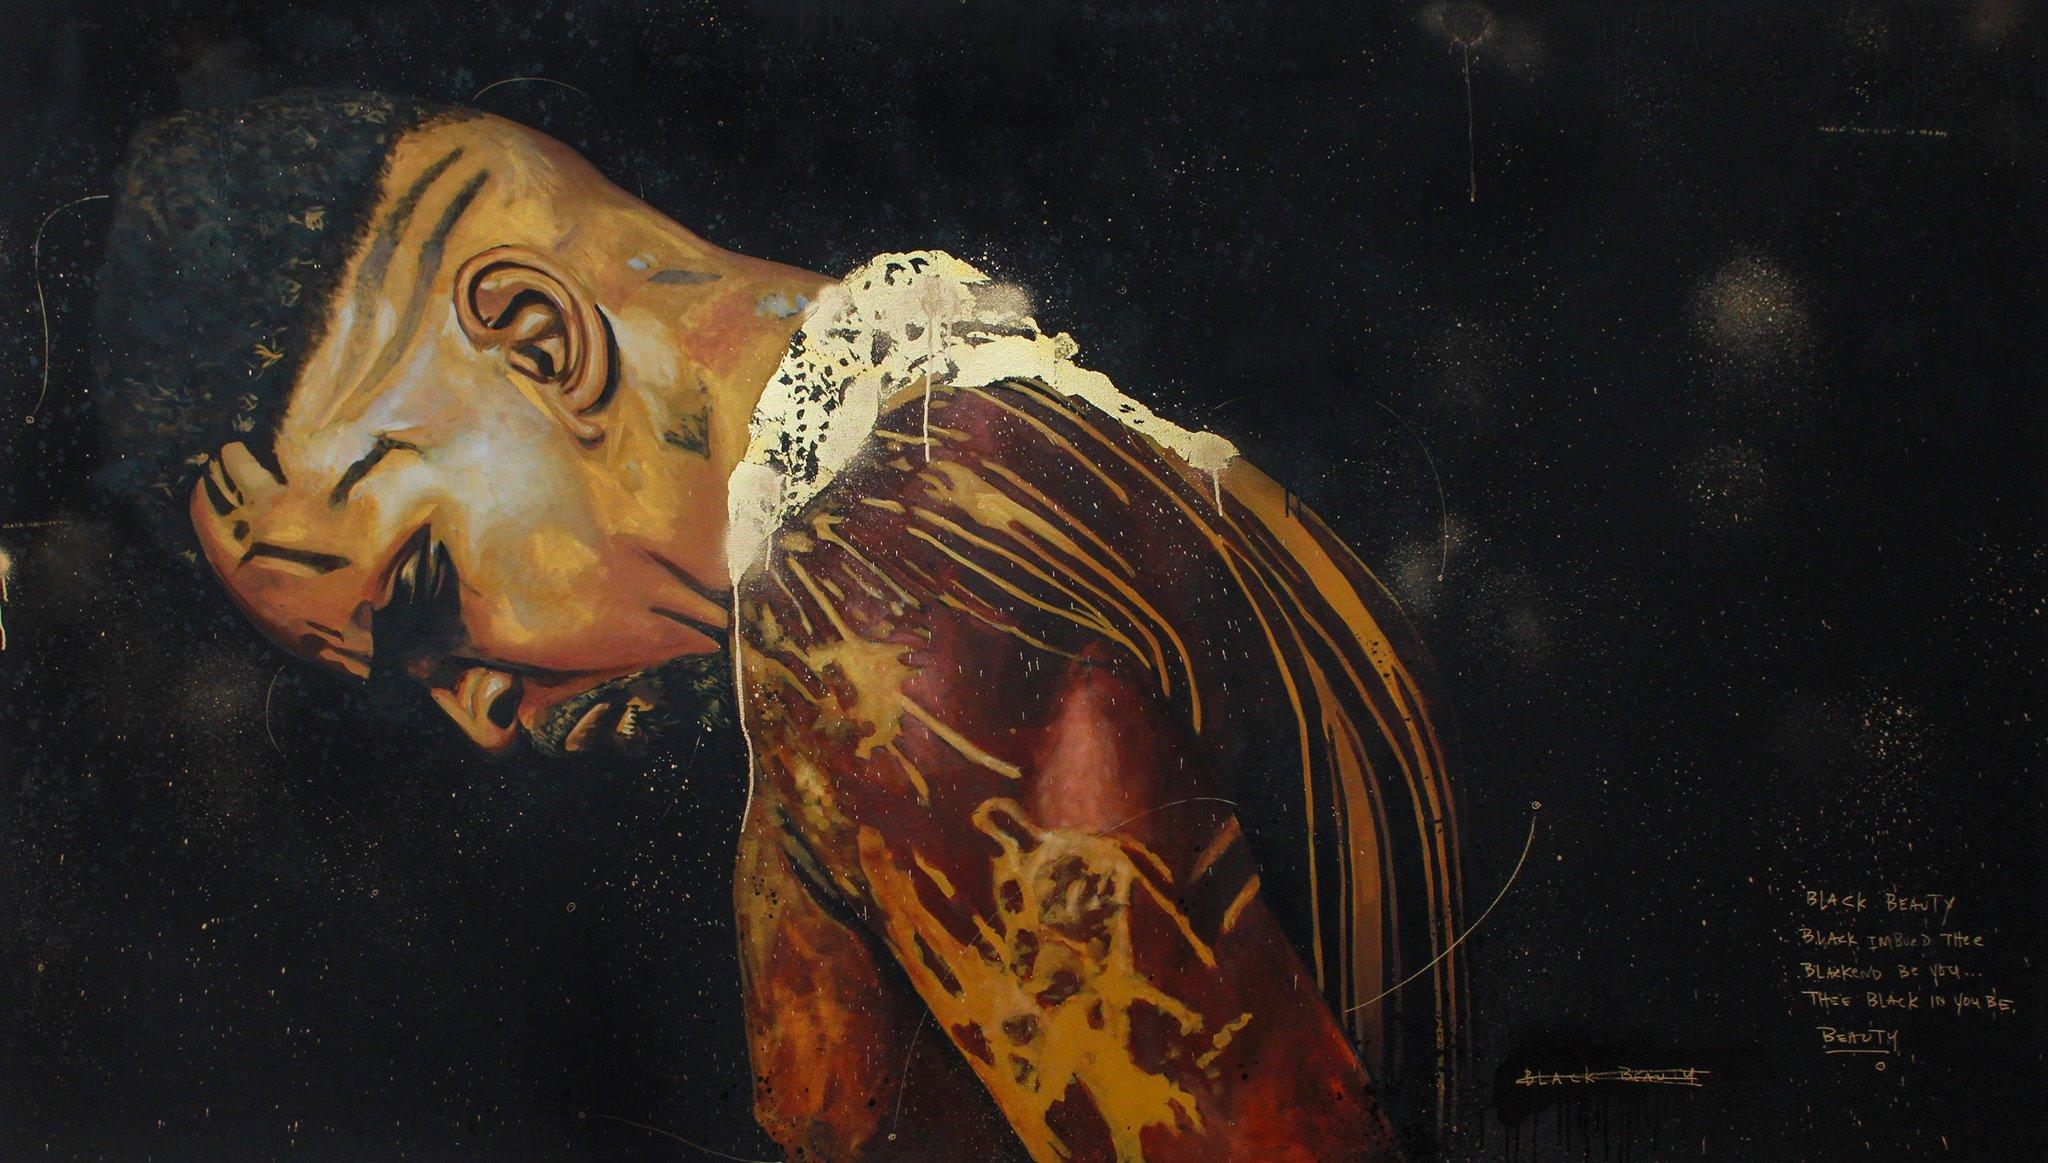 'Black Beauty' by Fahamu Pecou